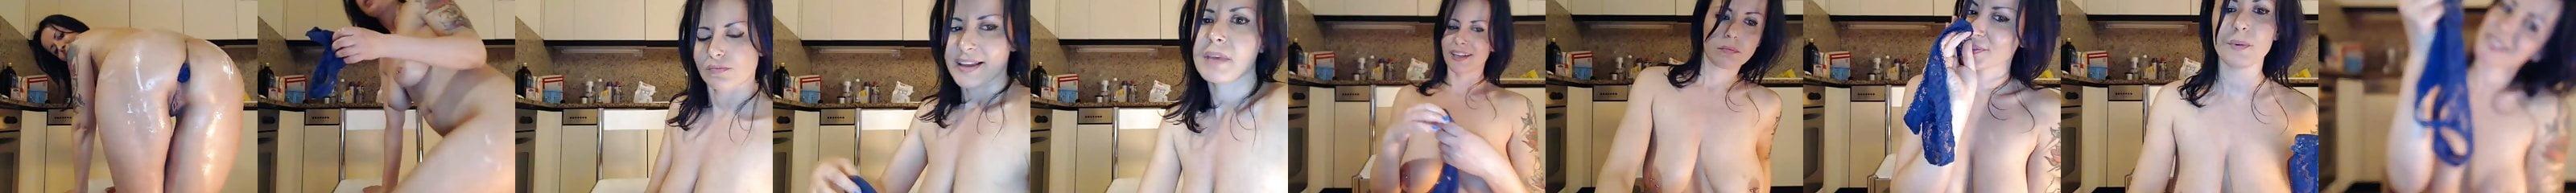 jessica stroup fake naked